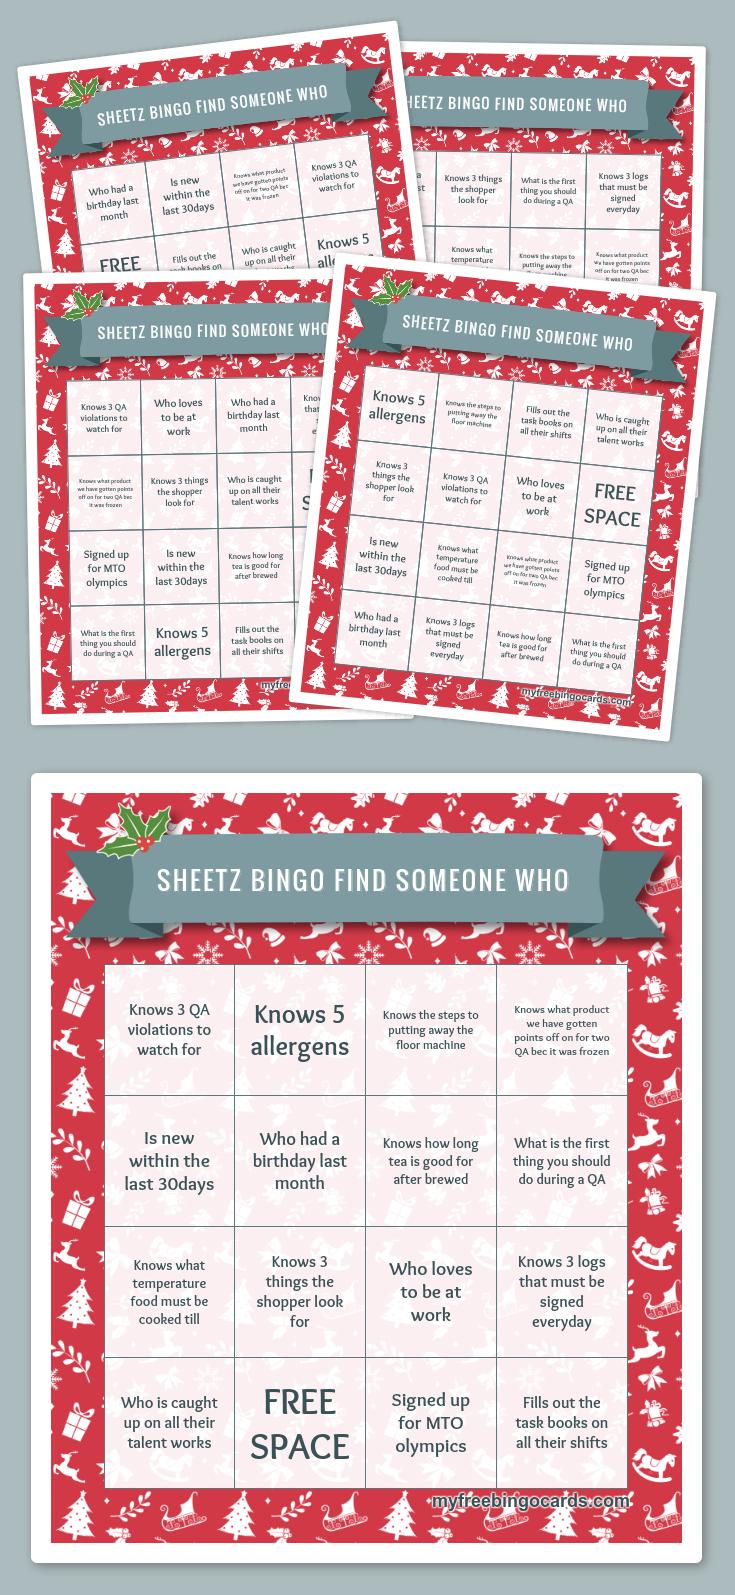 Sheetz Bingo Find someone who | Favorites | Pinterest